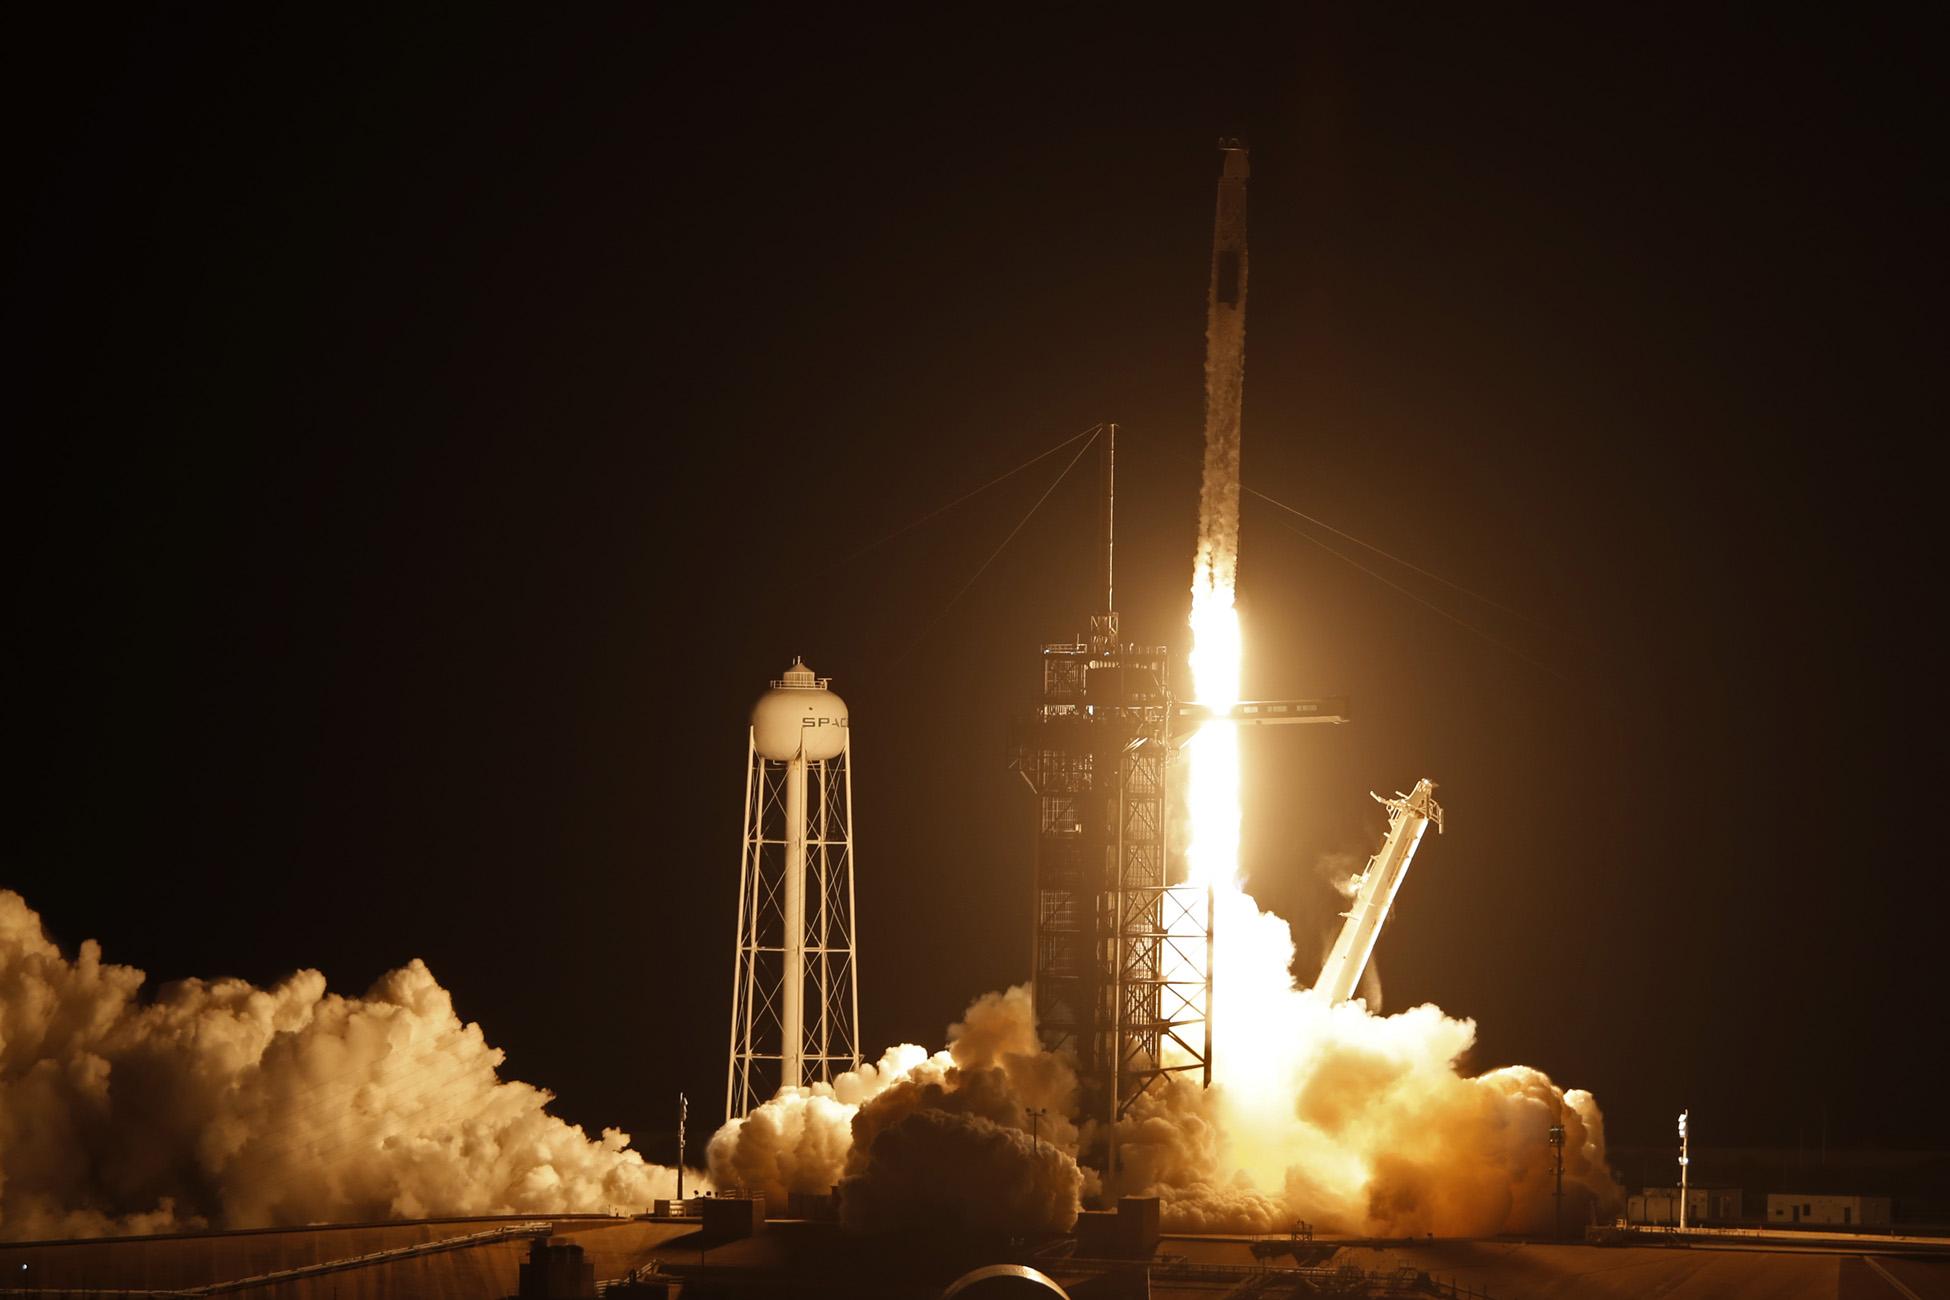 SpaceX: Ξεκίνησε το ταξίδι του για τον Διεθνή Διαστημικό Σταθμό